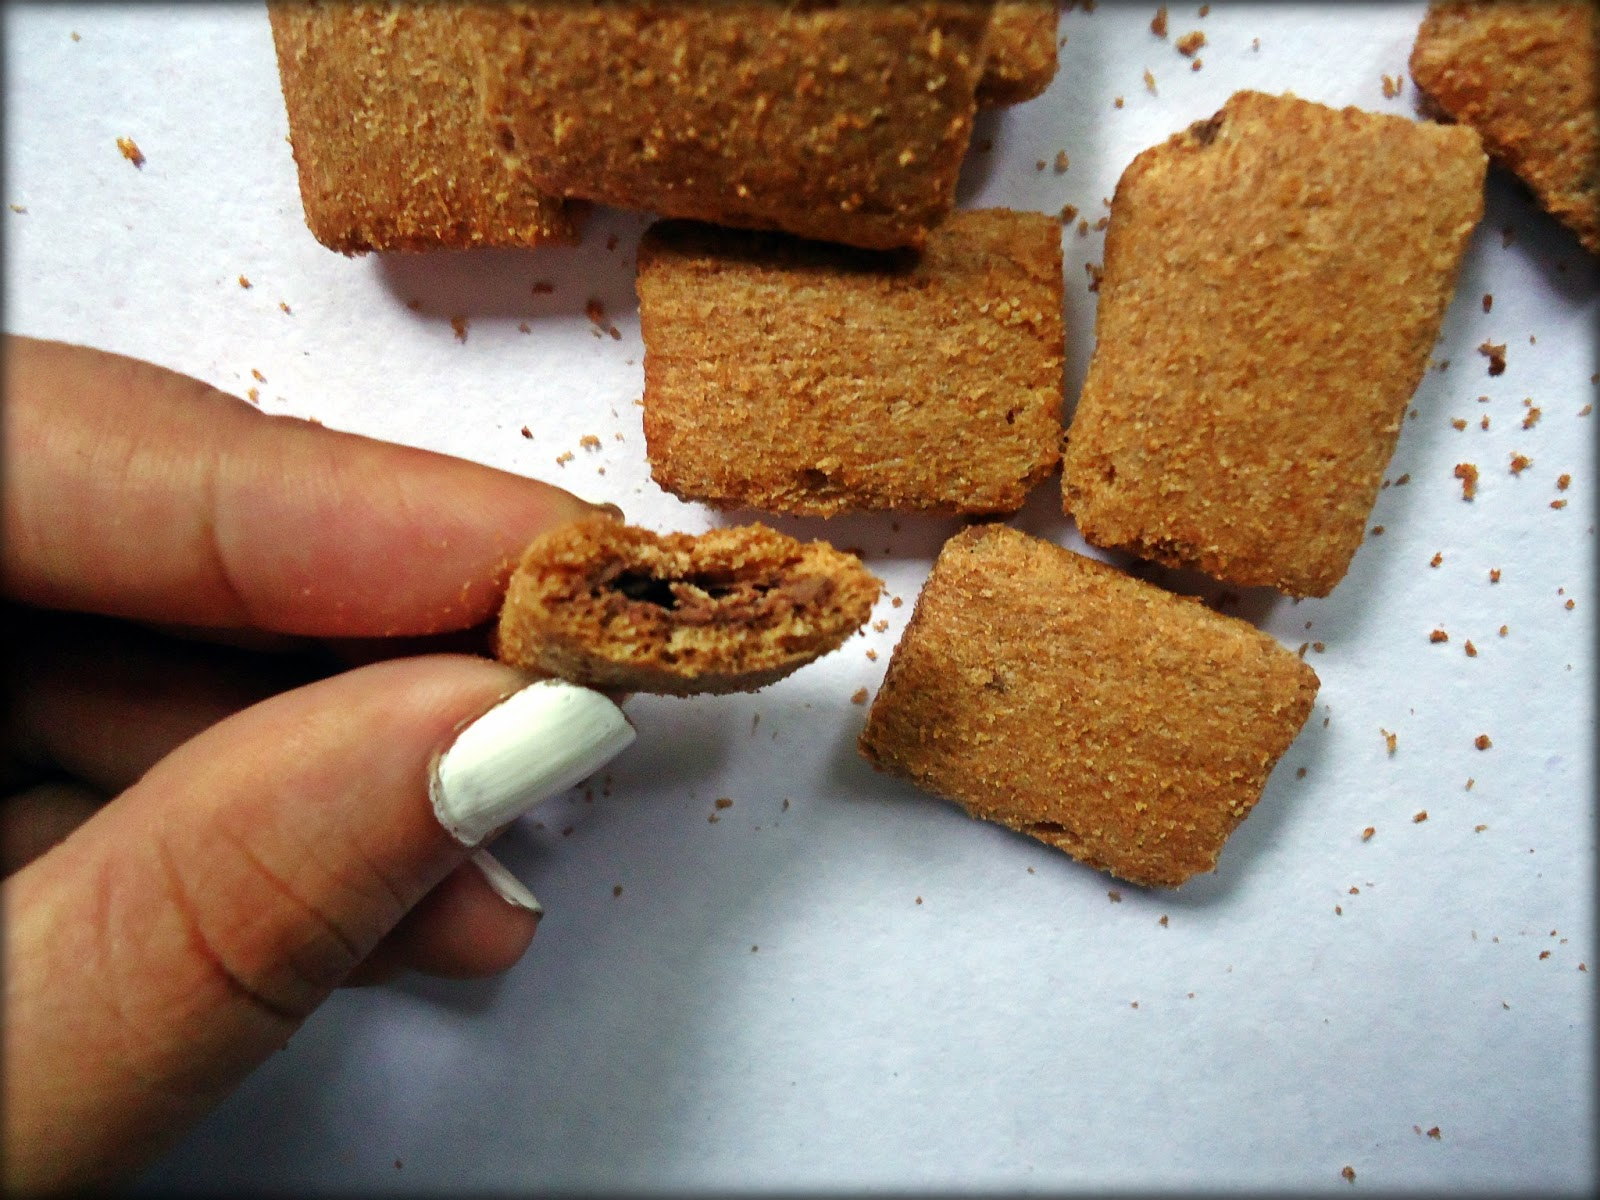 Chocosophy: Win Win Magic Crunch chocolate-filled corn snack